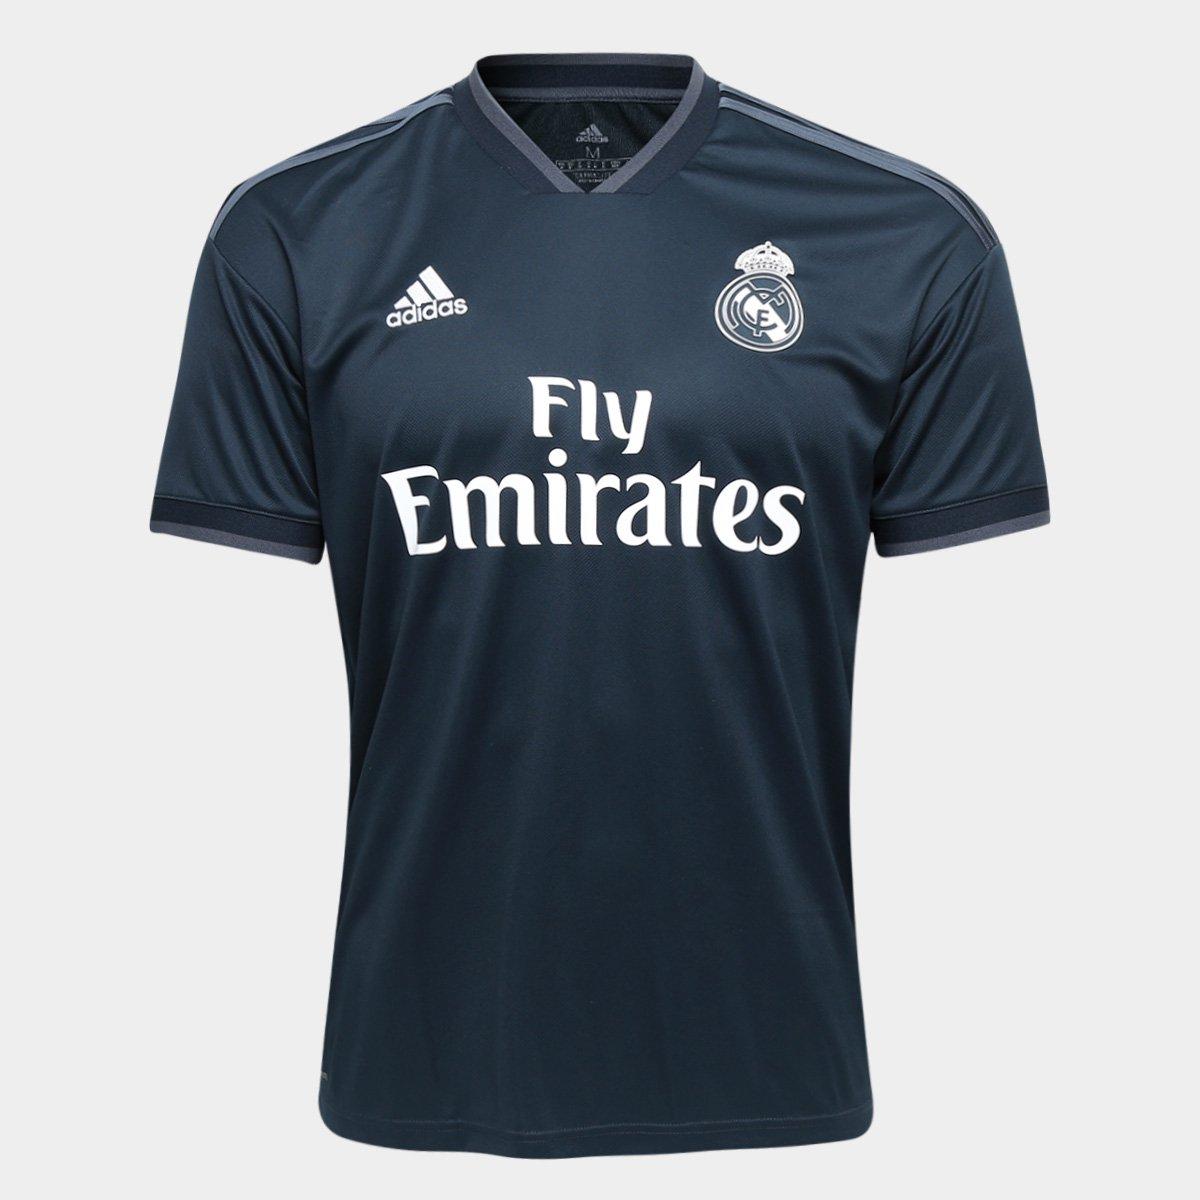 45d0ea545f Camisa Real Madrid Away 2018 s n° Torcedor Adidas Masculina